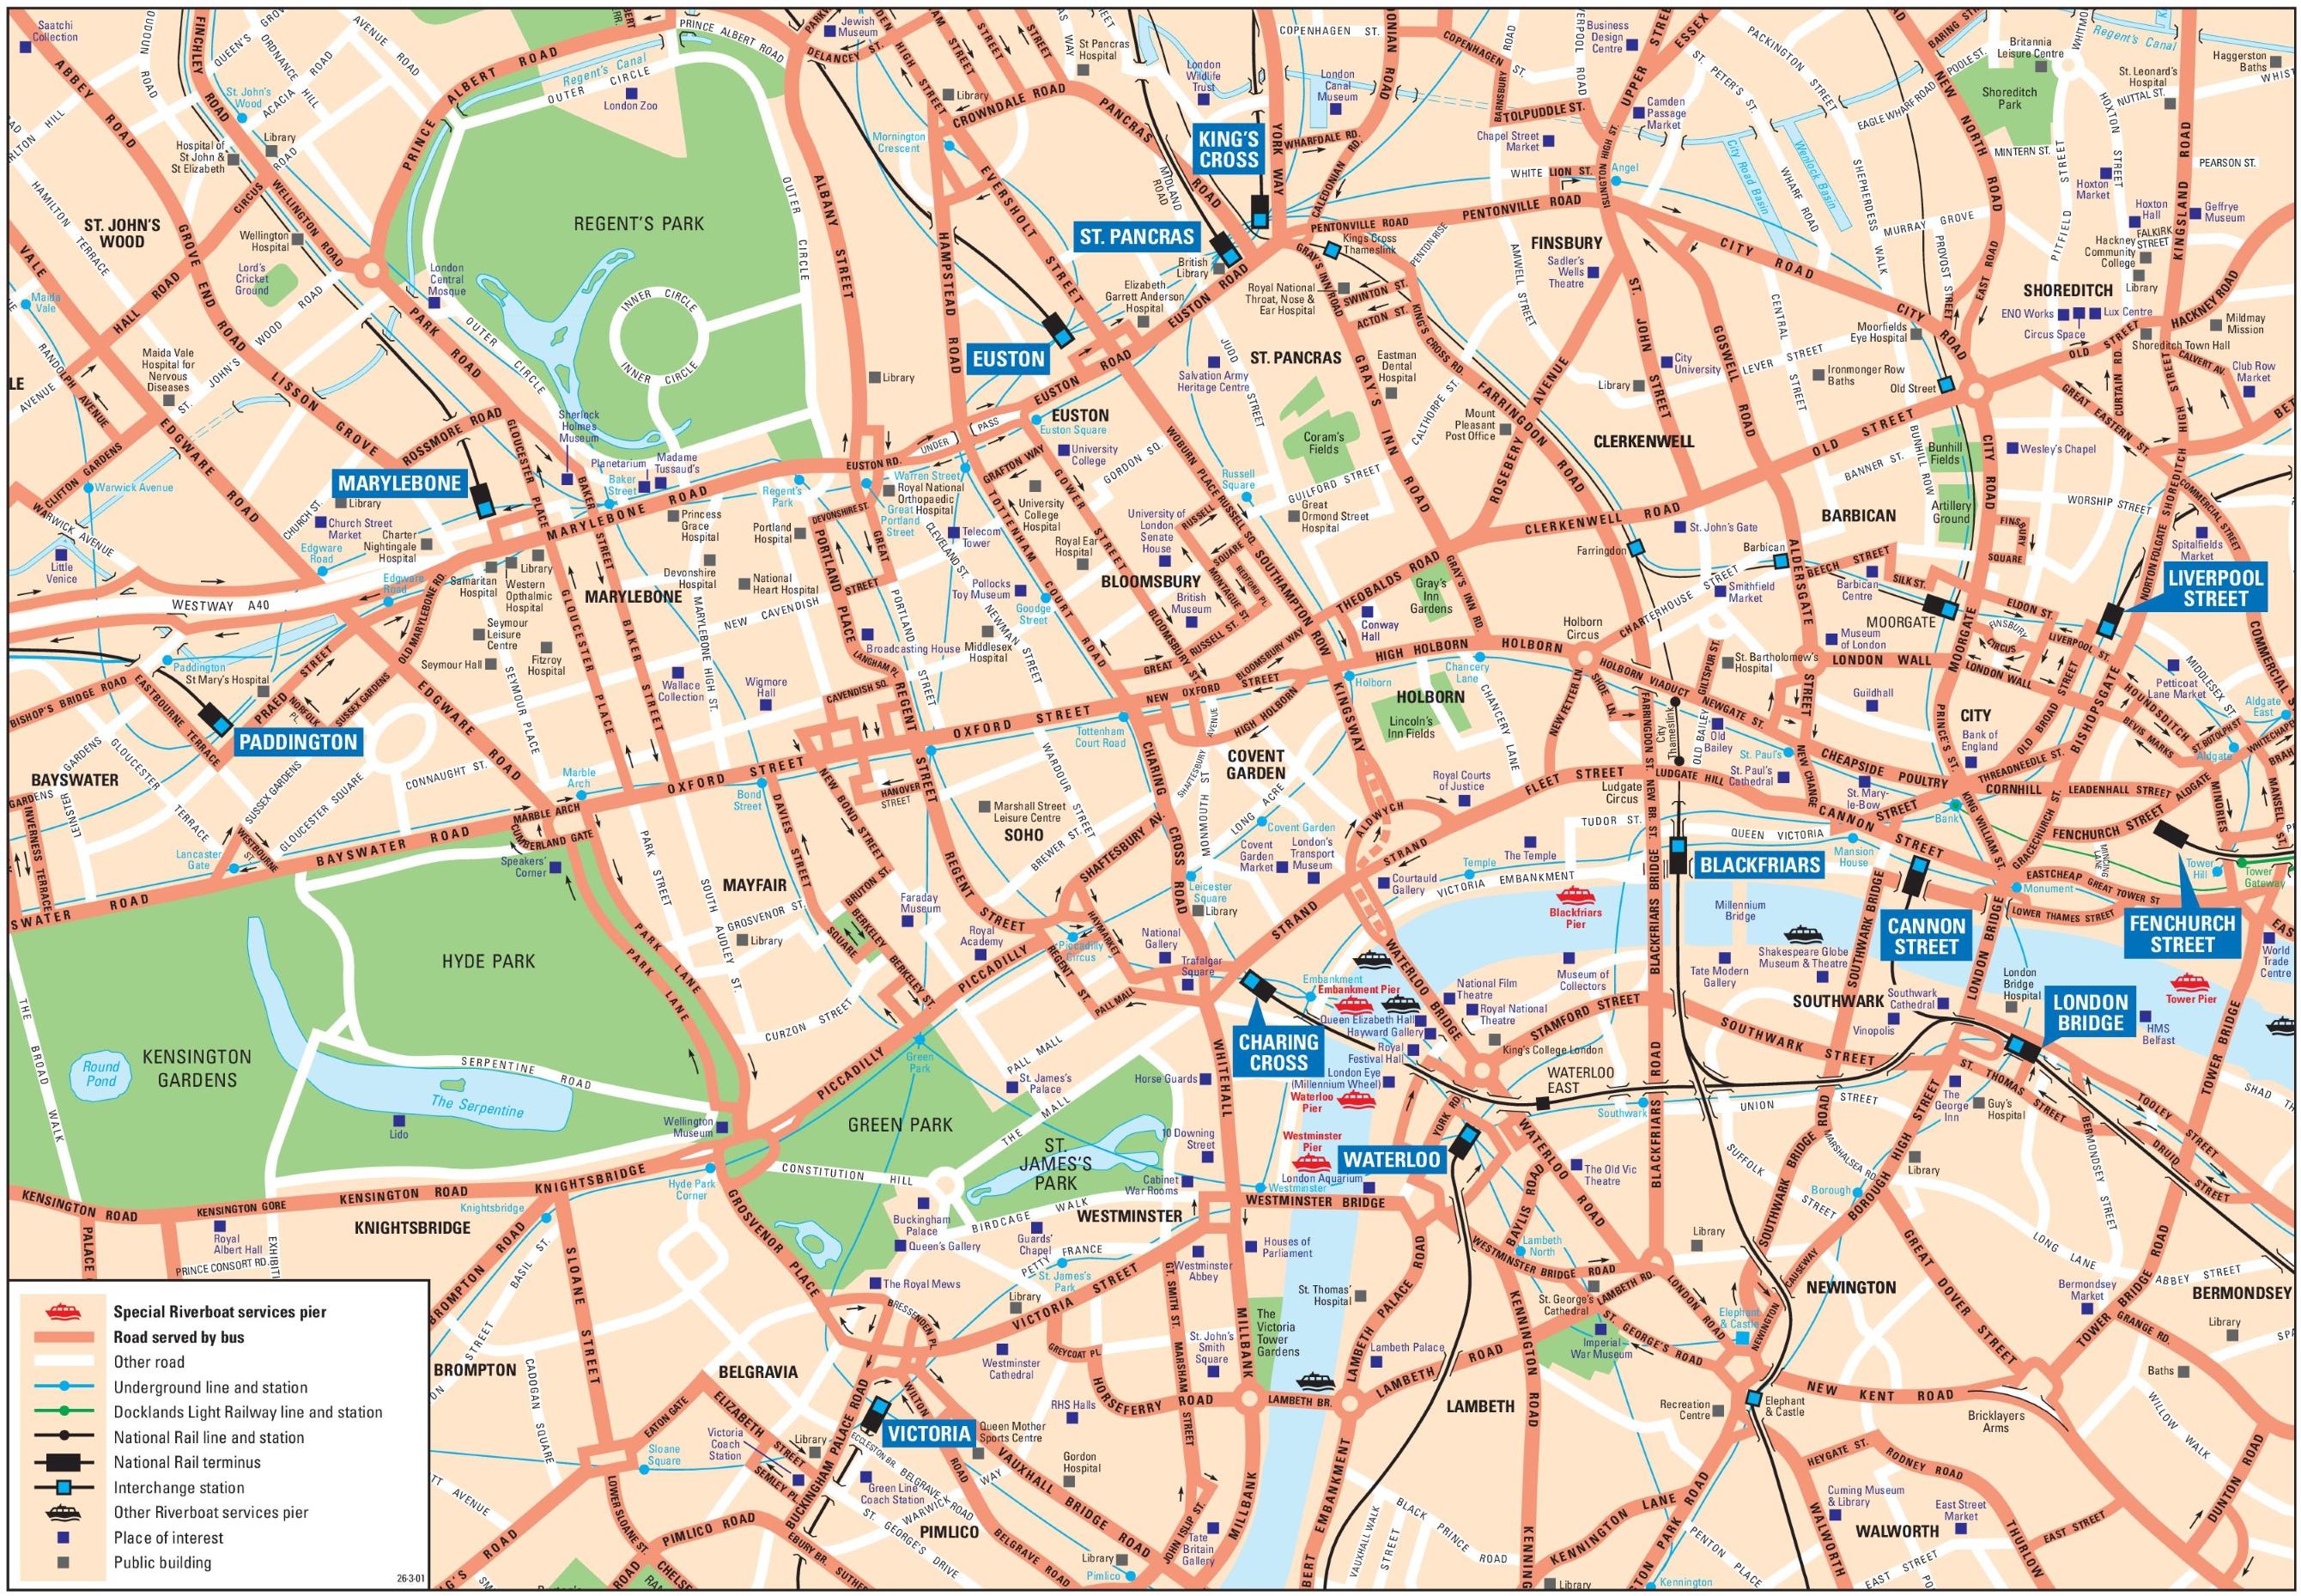 London City Map London city center map